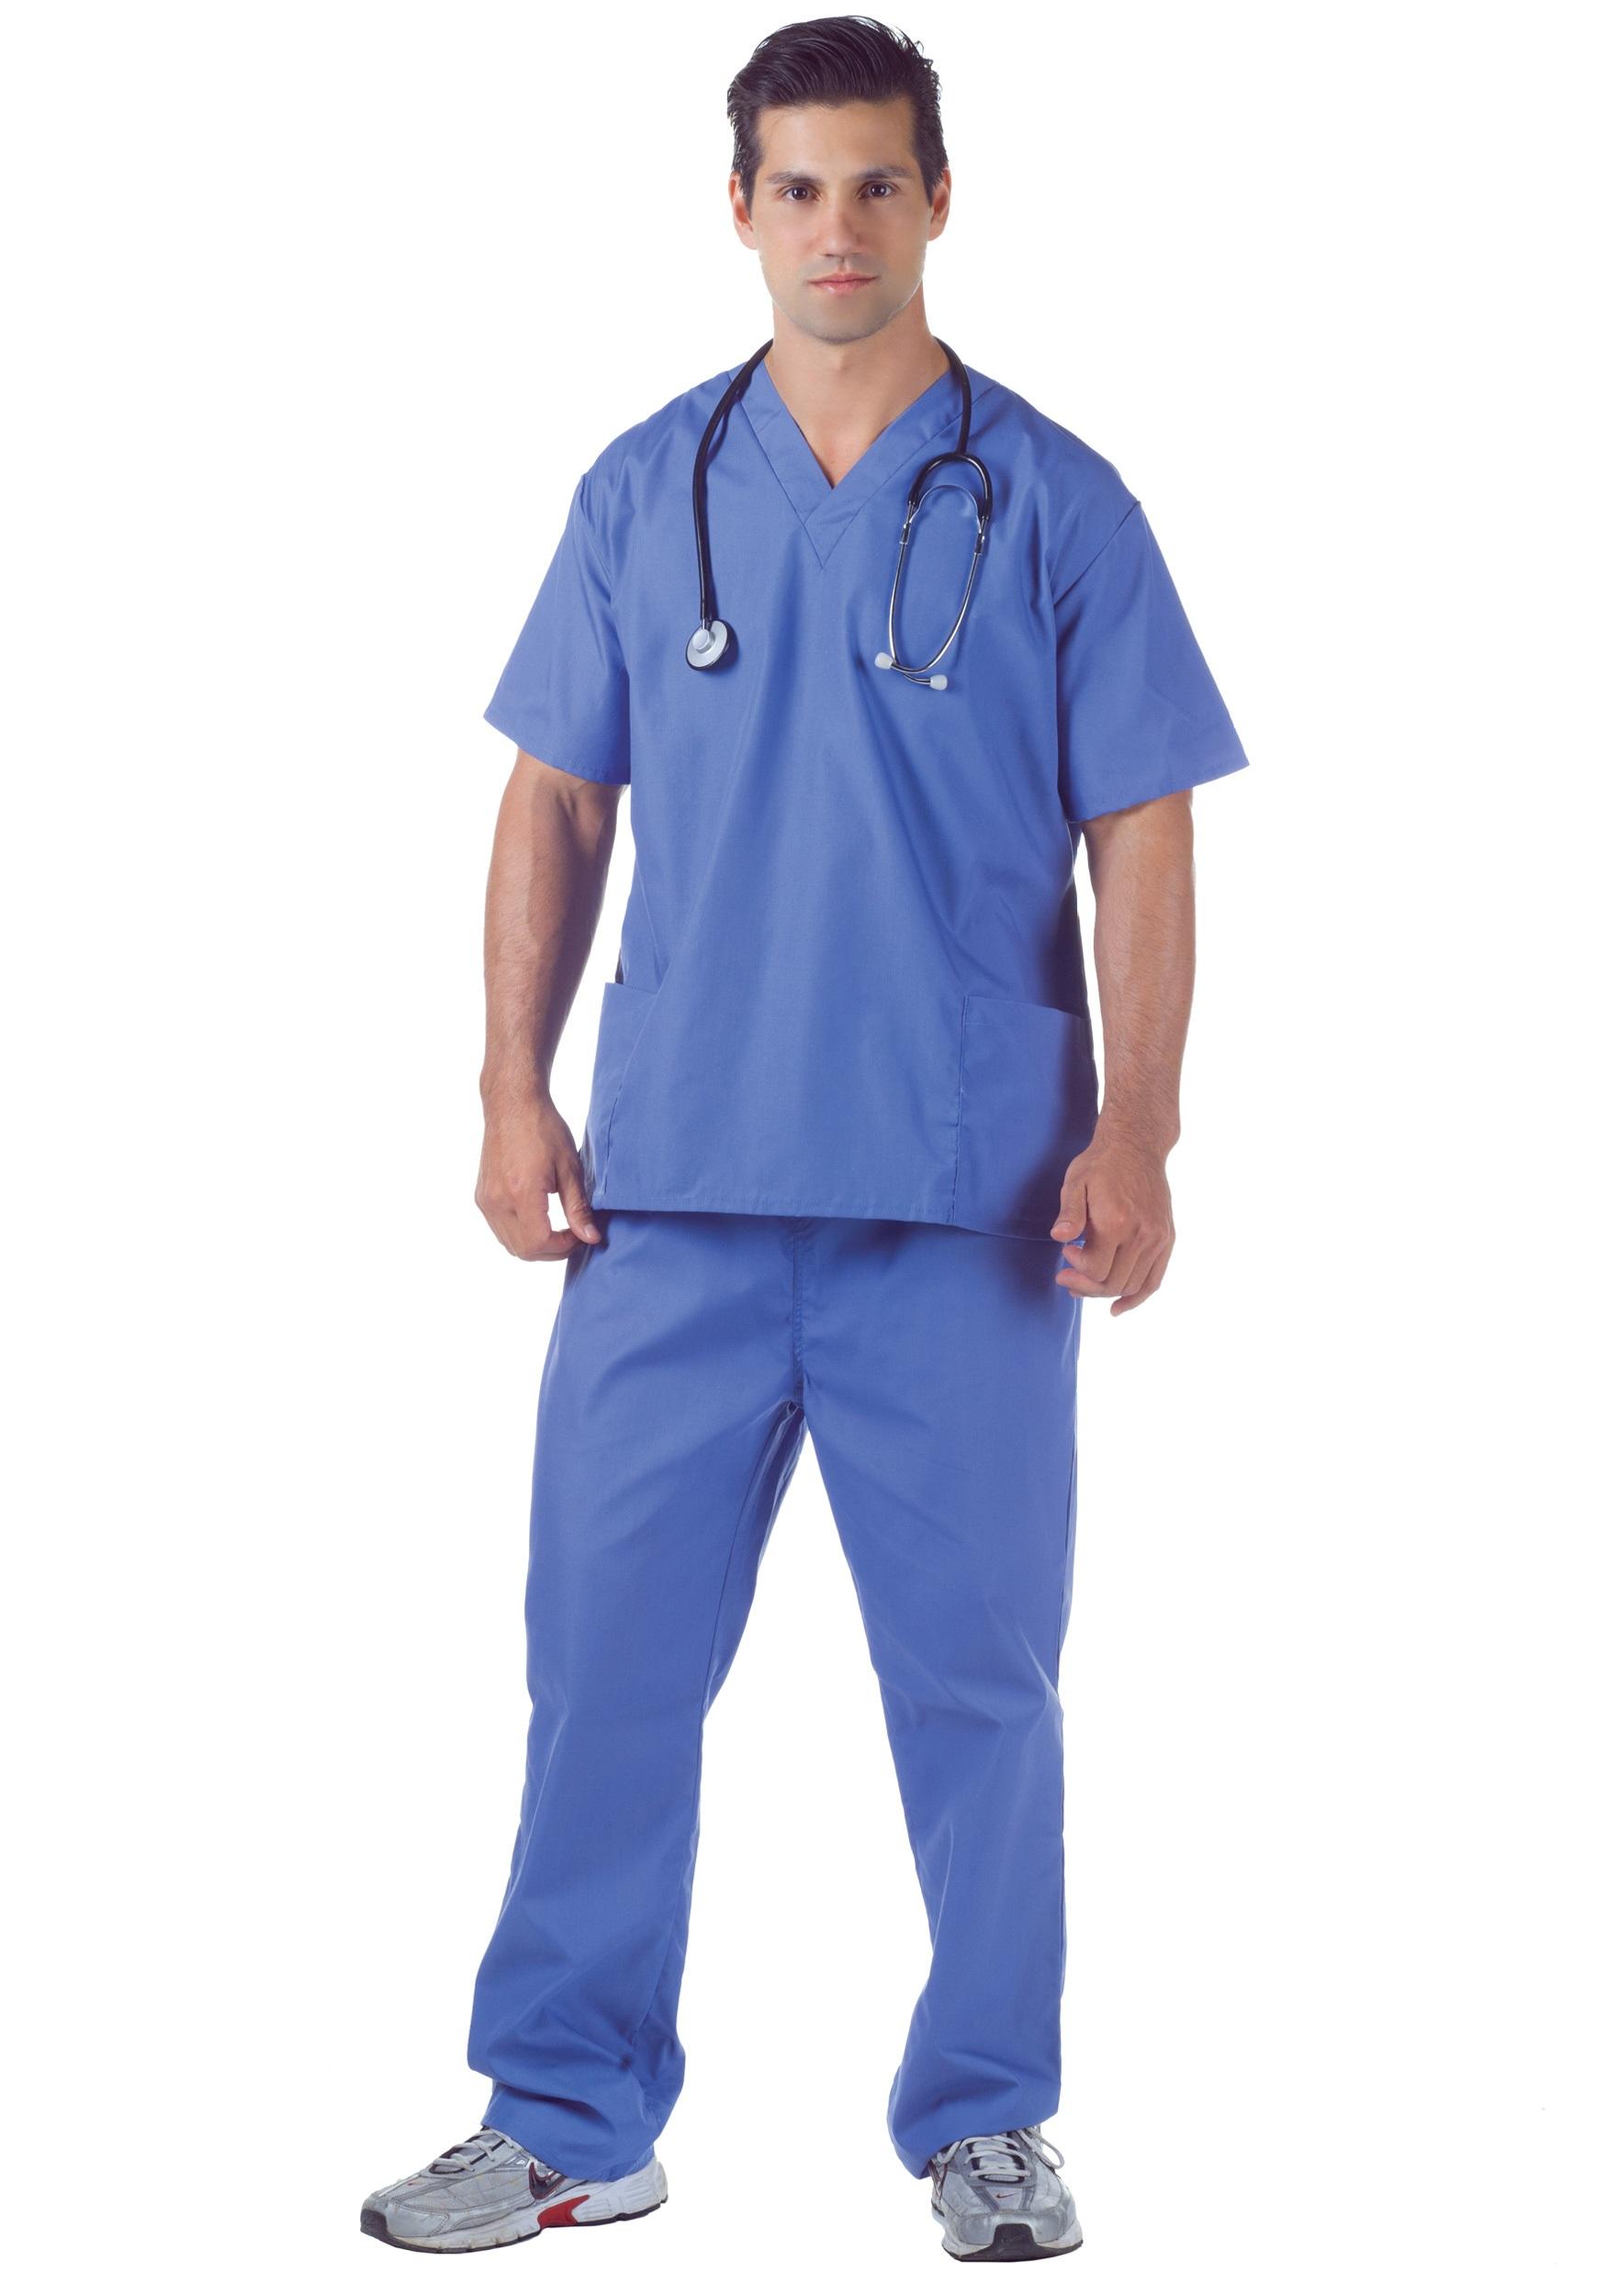 Plus Size Doctor C. Bush Costume - Mens Adult Humor Doctor